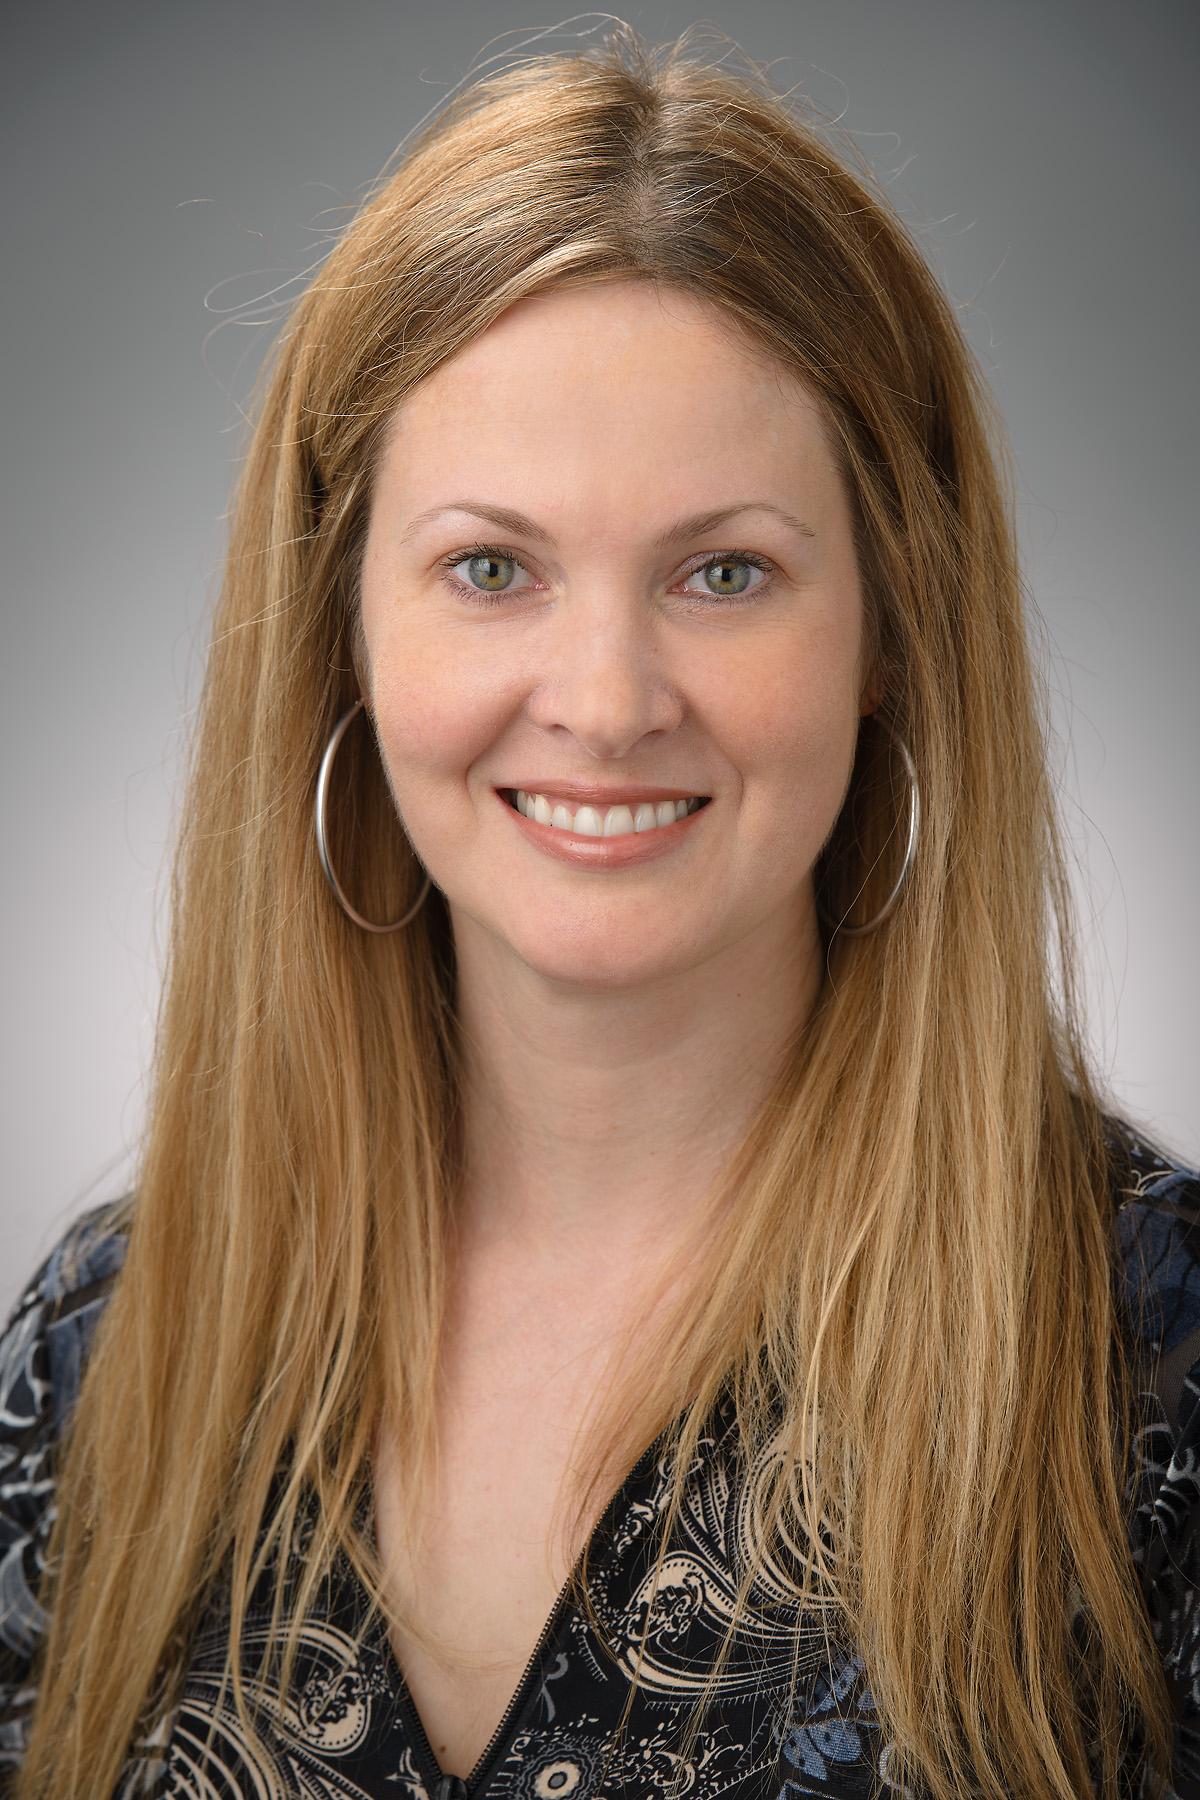 Jennifer Baxley